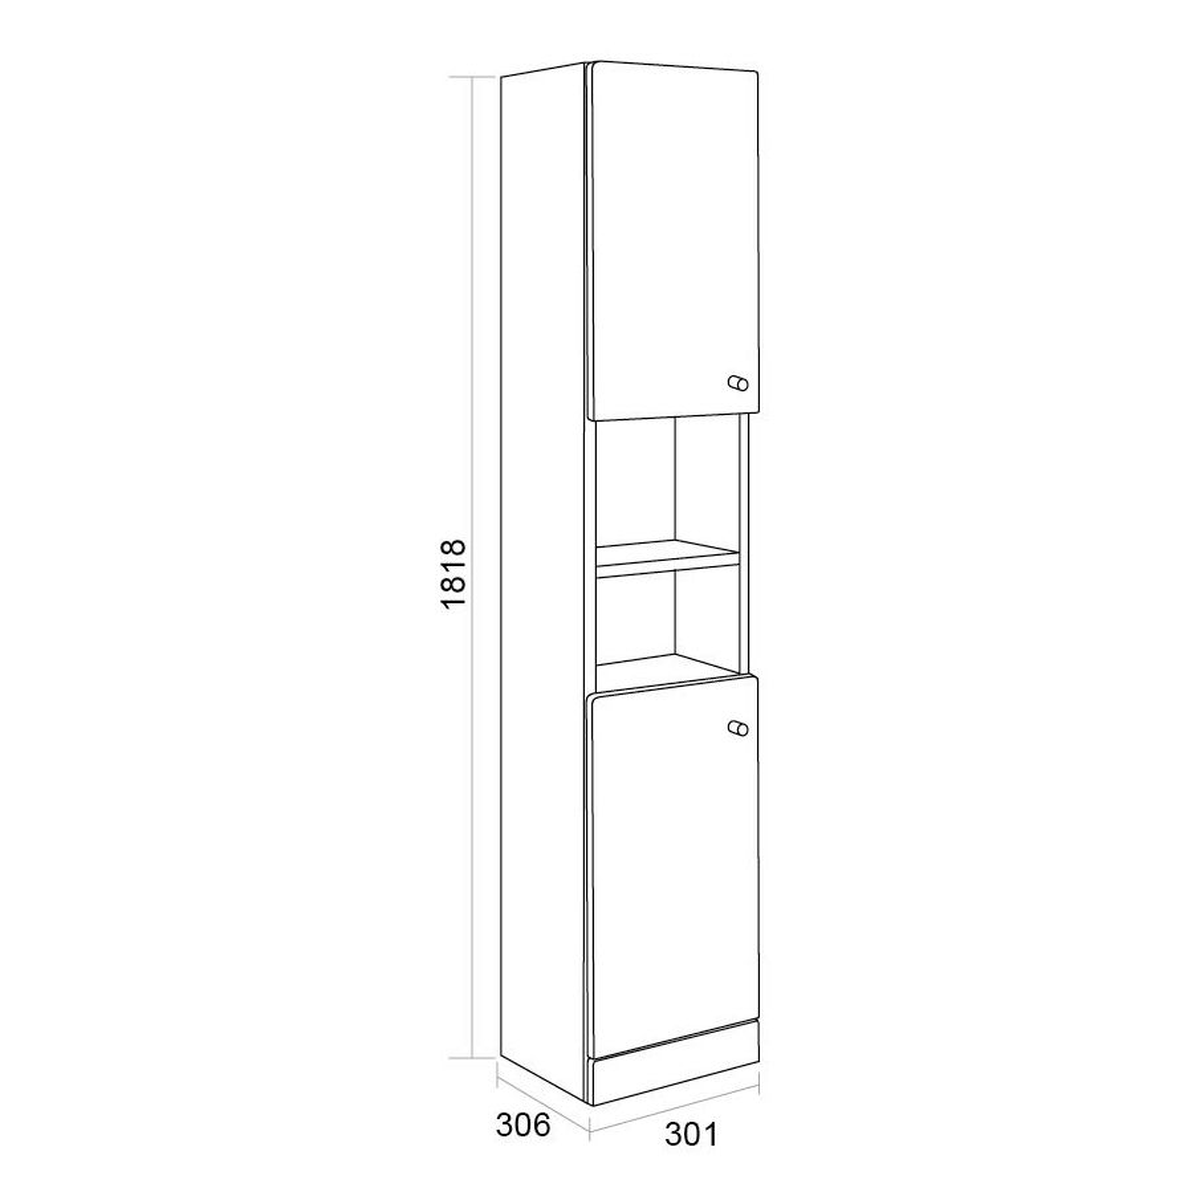 Ikoma White Gloss Tall Unit Dimensions